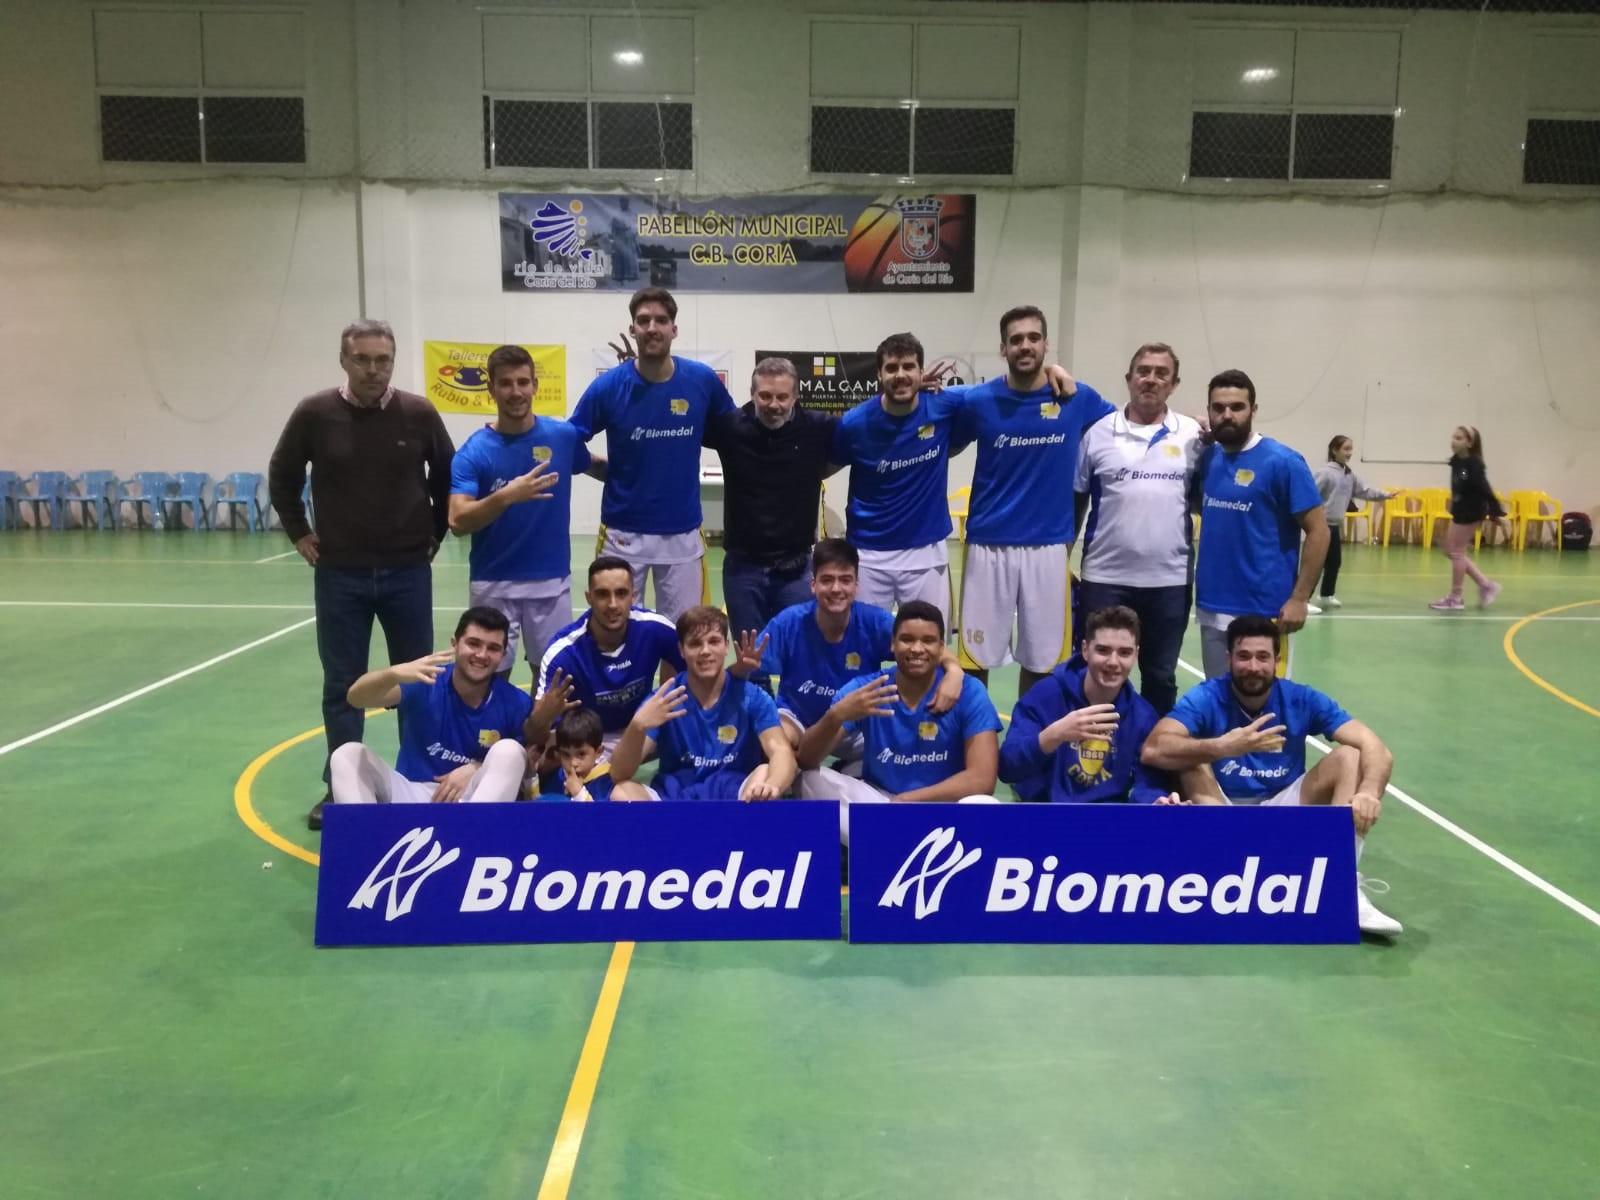 Biomedal patrocina al equipo de baloncesto conocido como CB Coria.